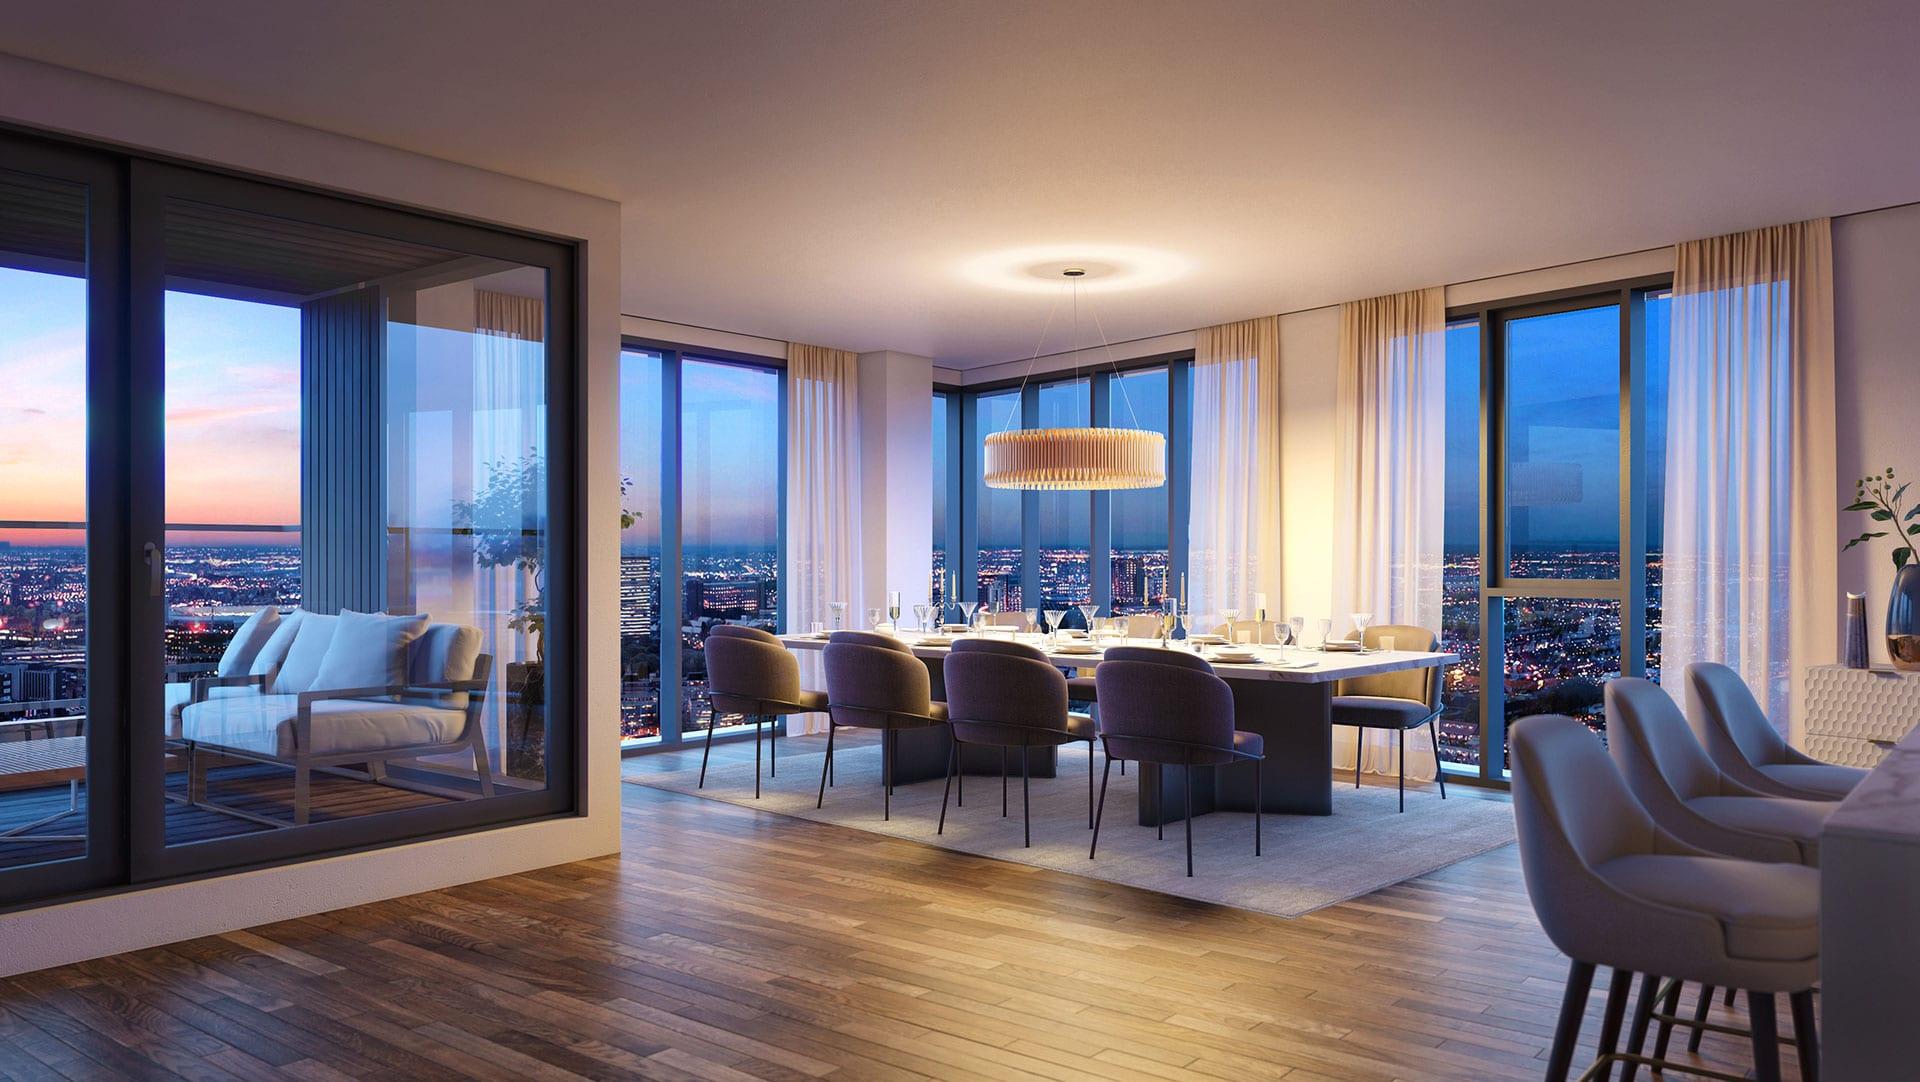 cgi-penthouse-interior-residential-night-powerhouse-company-bunkertoren-eindhoven-copyright-kaiserbold-com